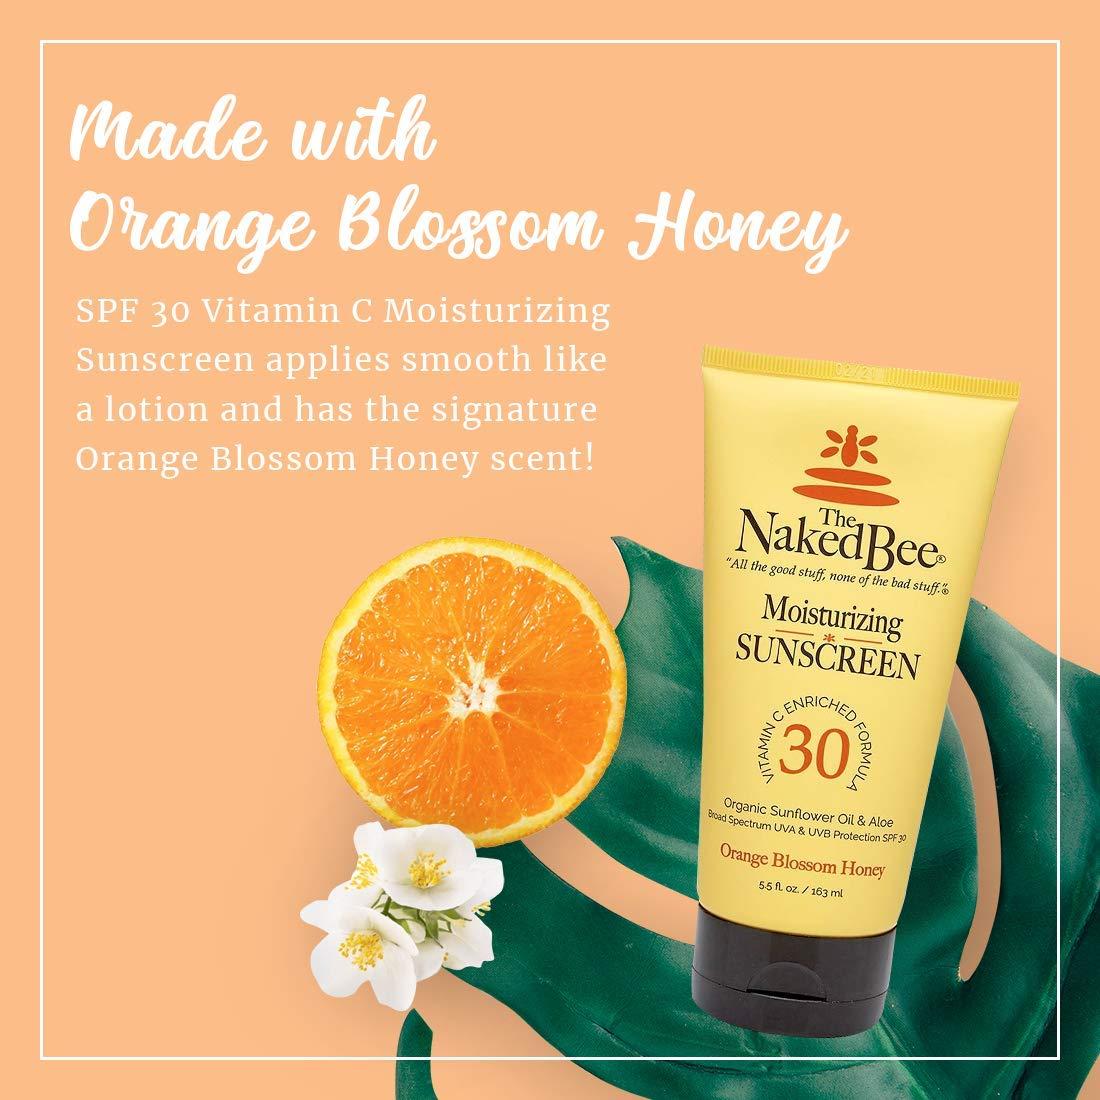 The Naked Bee Vitamin C Face & Body Moisturizing Sunscreen Spf 30 5.5 Oz